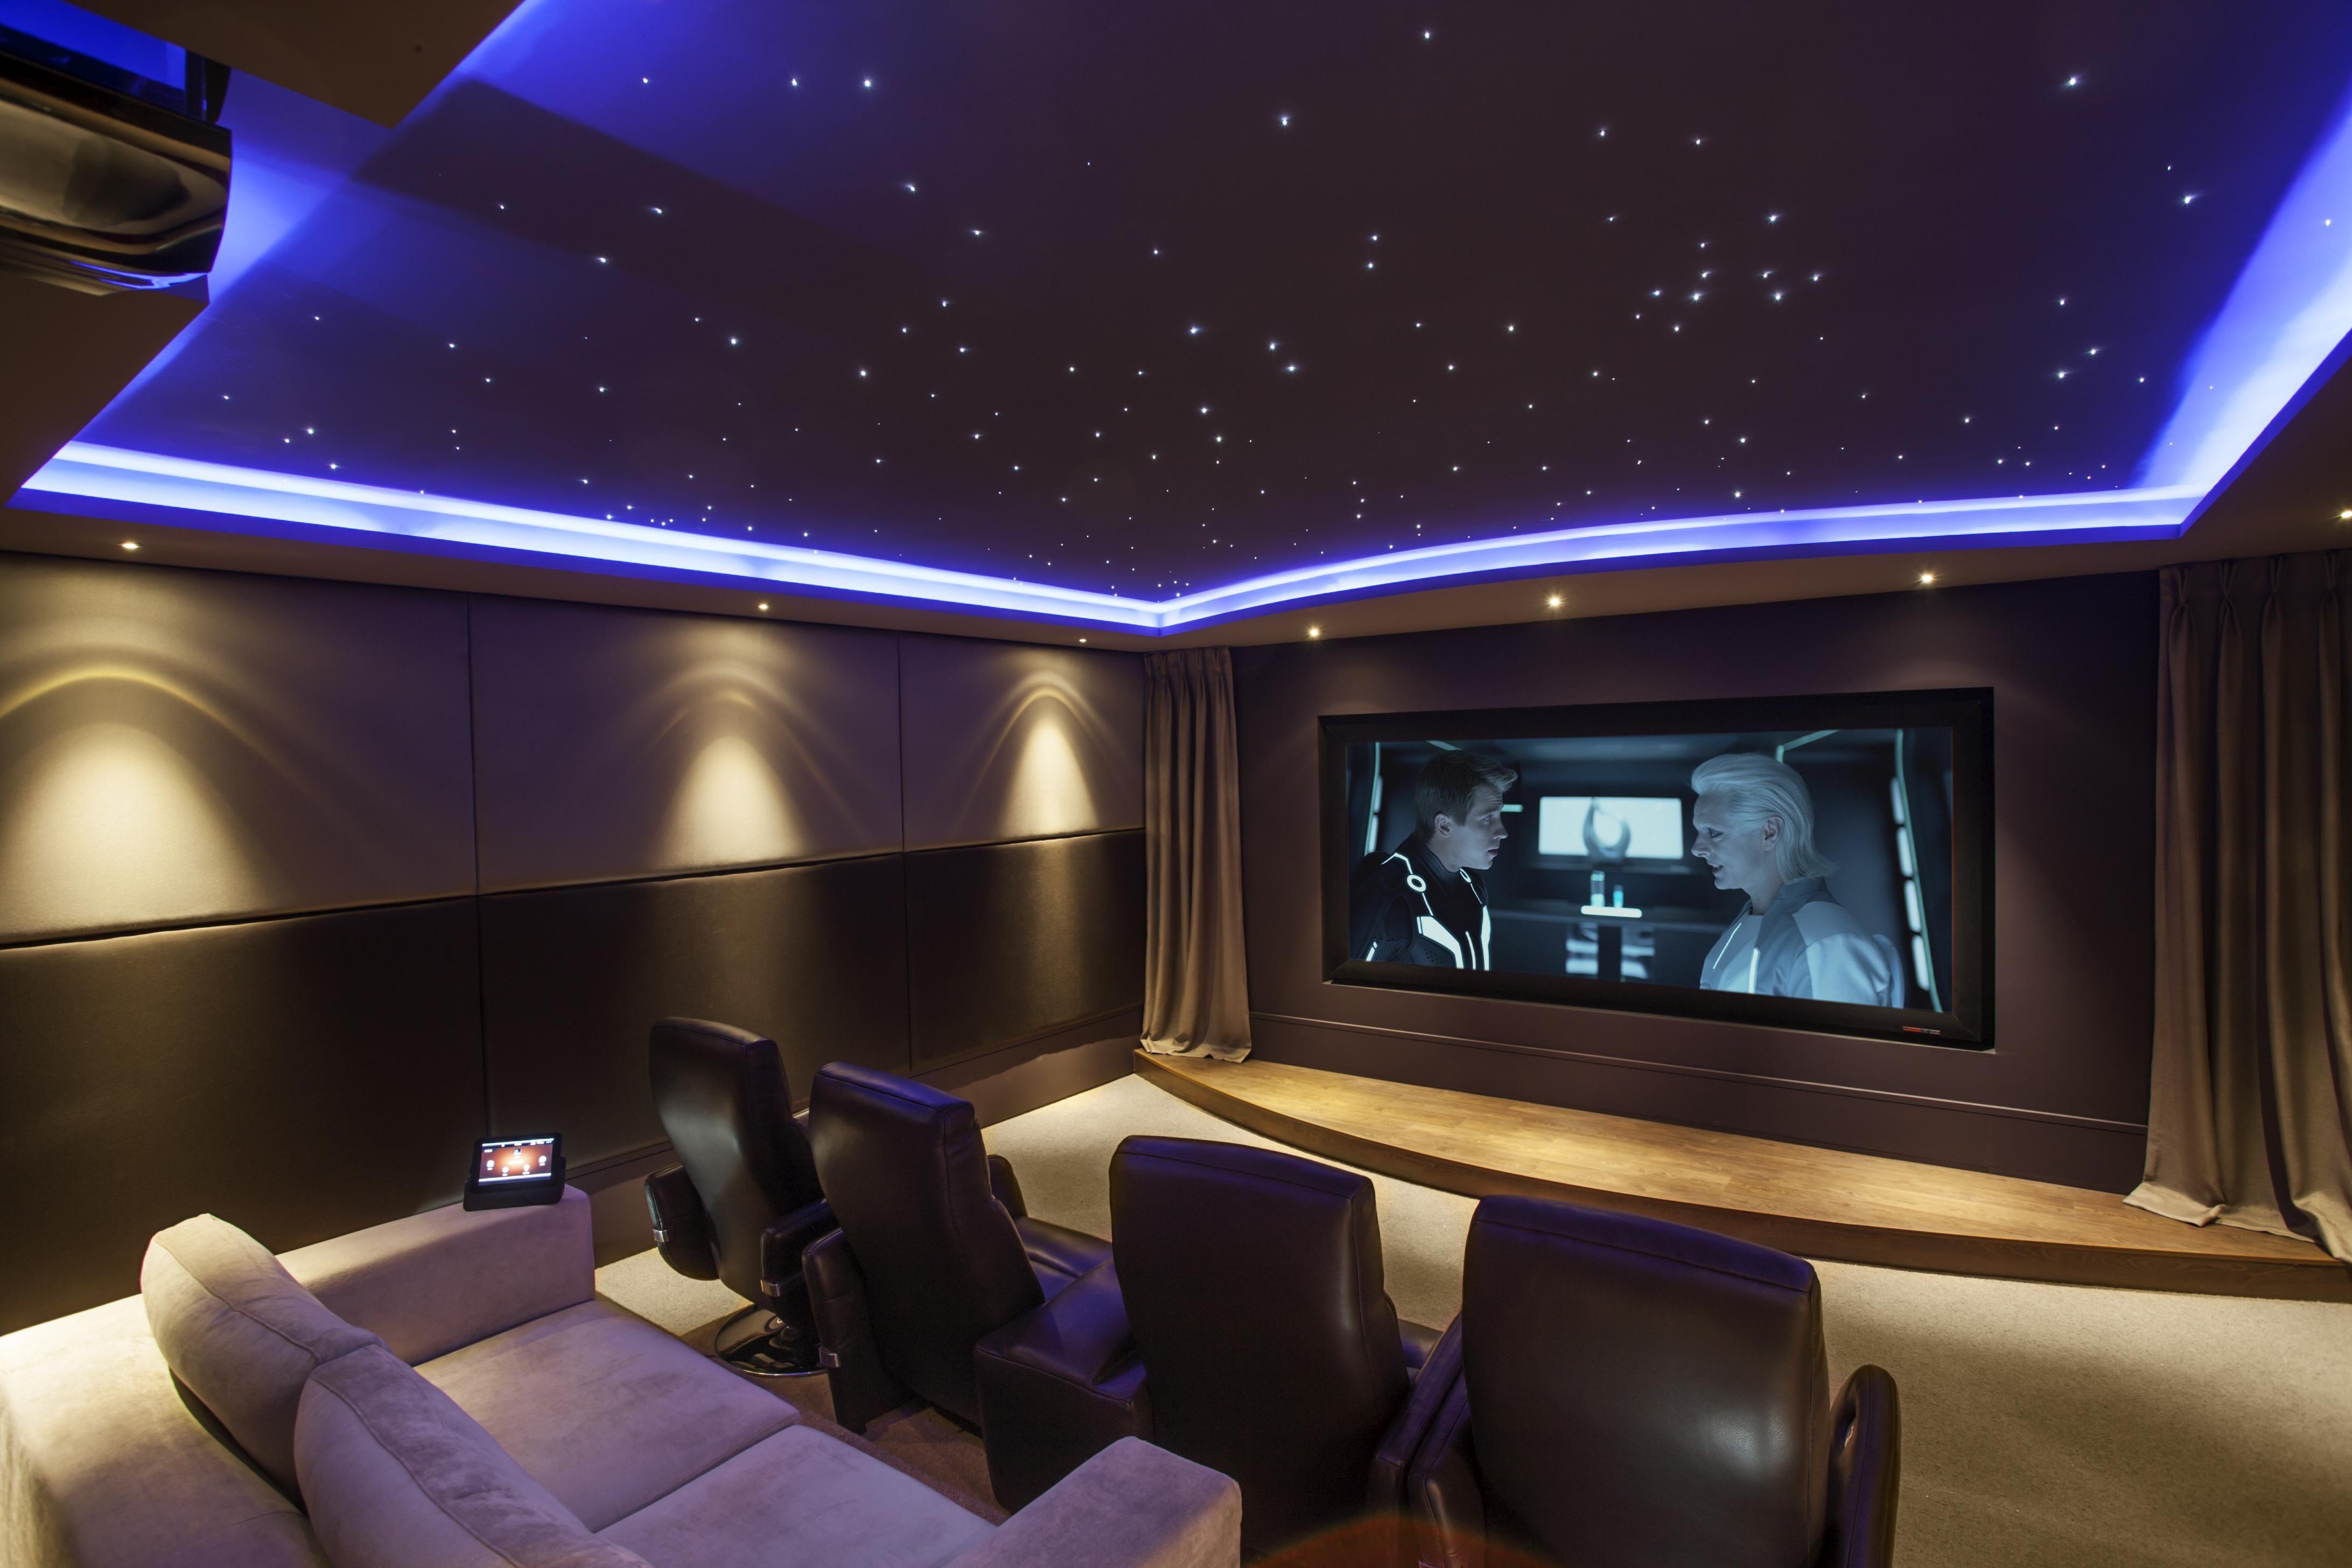 Indoor Cinema Ideas 3 Home Cinema Room Home Theater Room Design Home Theater Lighting